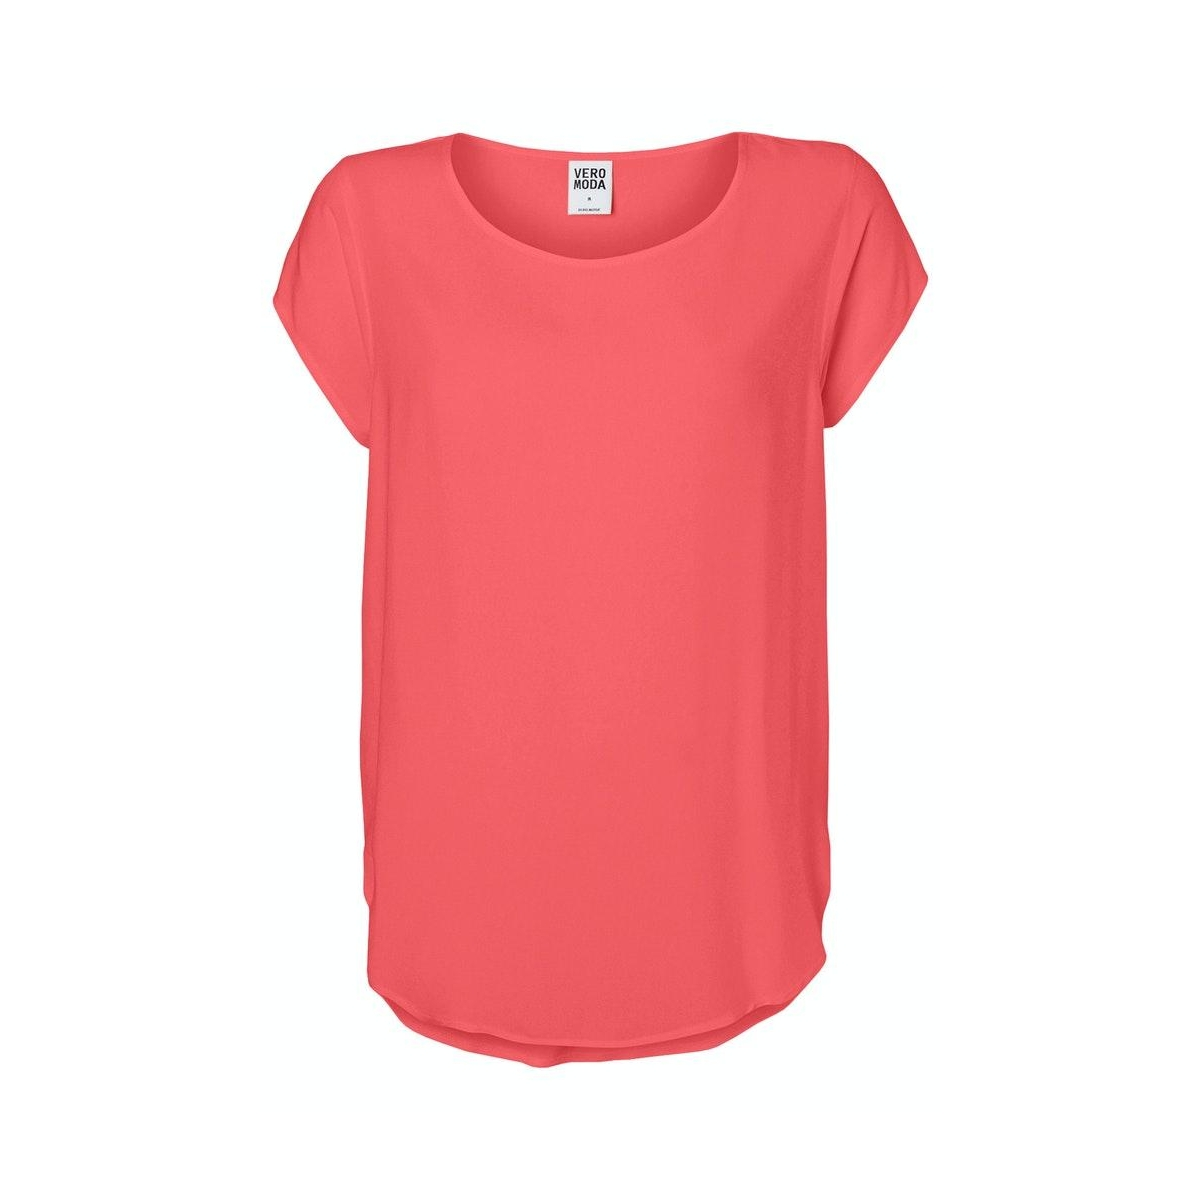 vmboca ss blouse  color 10104053 vero moda t-shirt dubarry